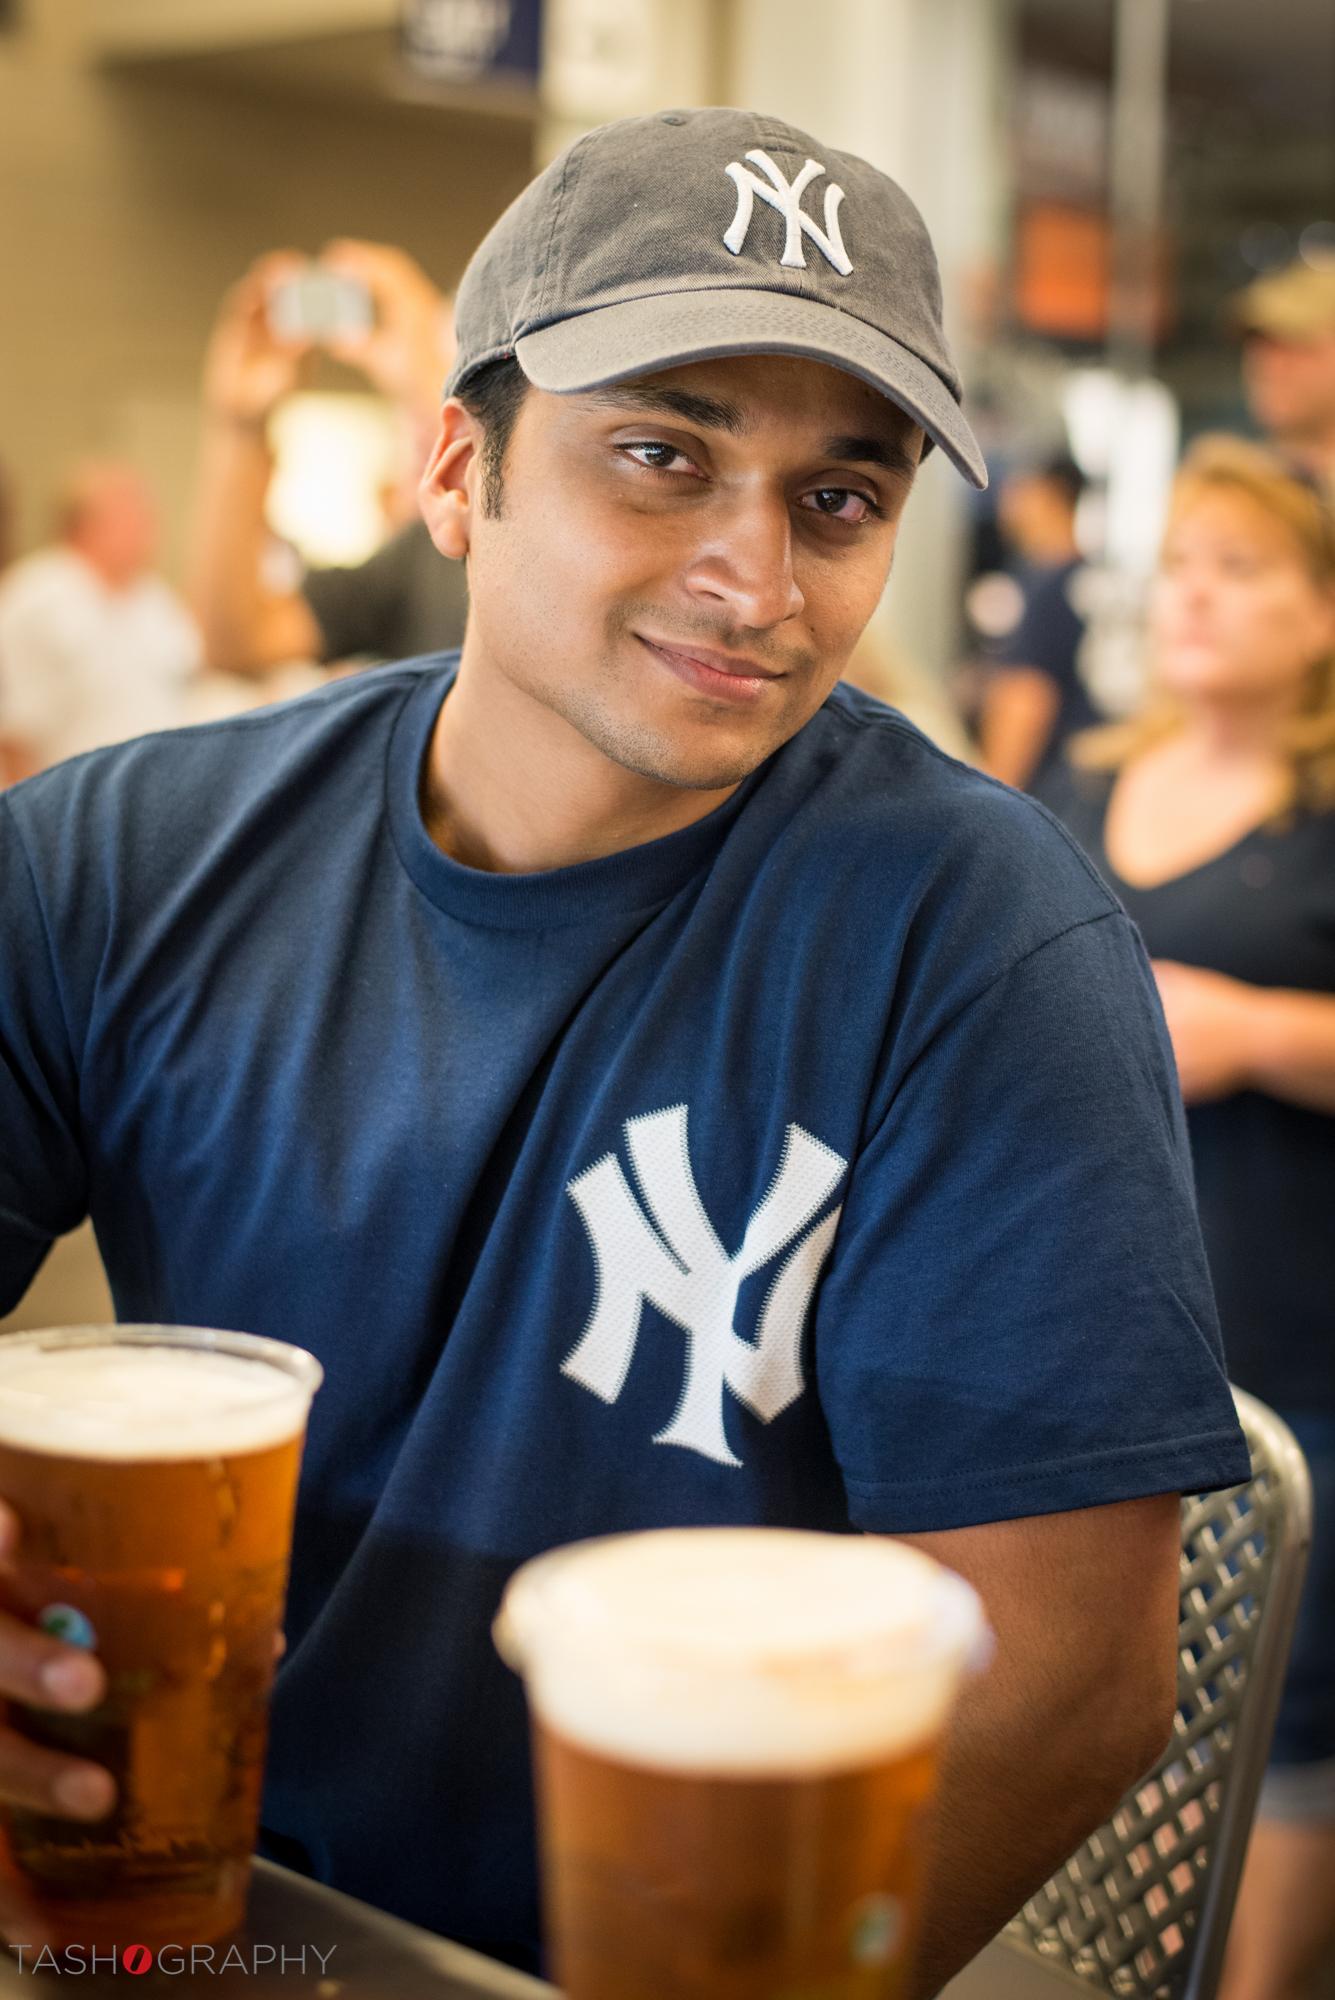 Yankees-090314-48.jpg